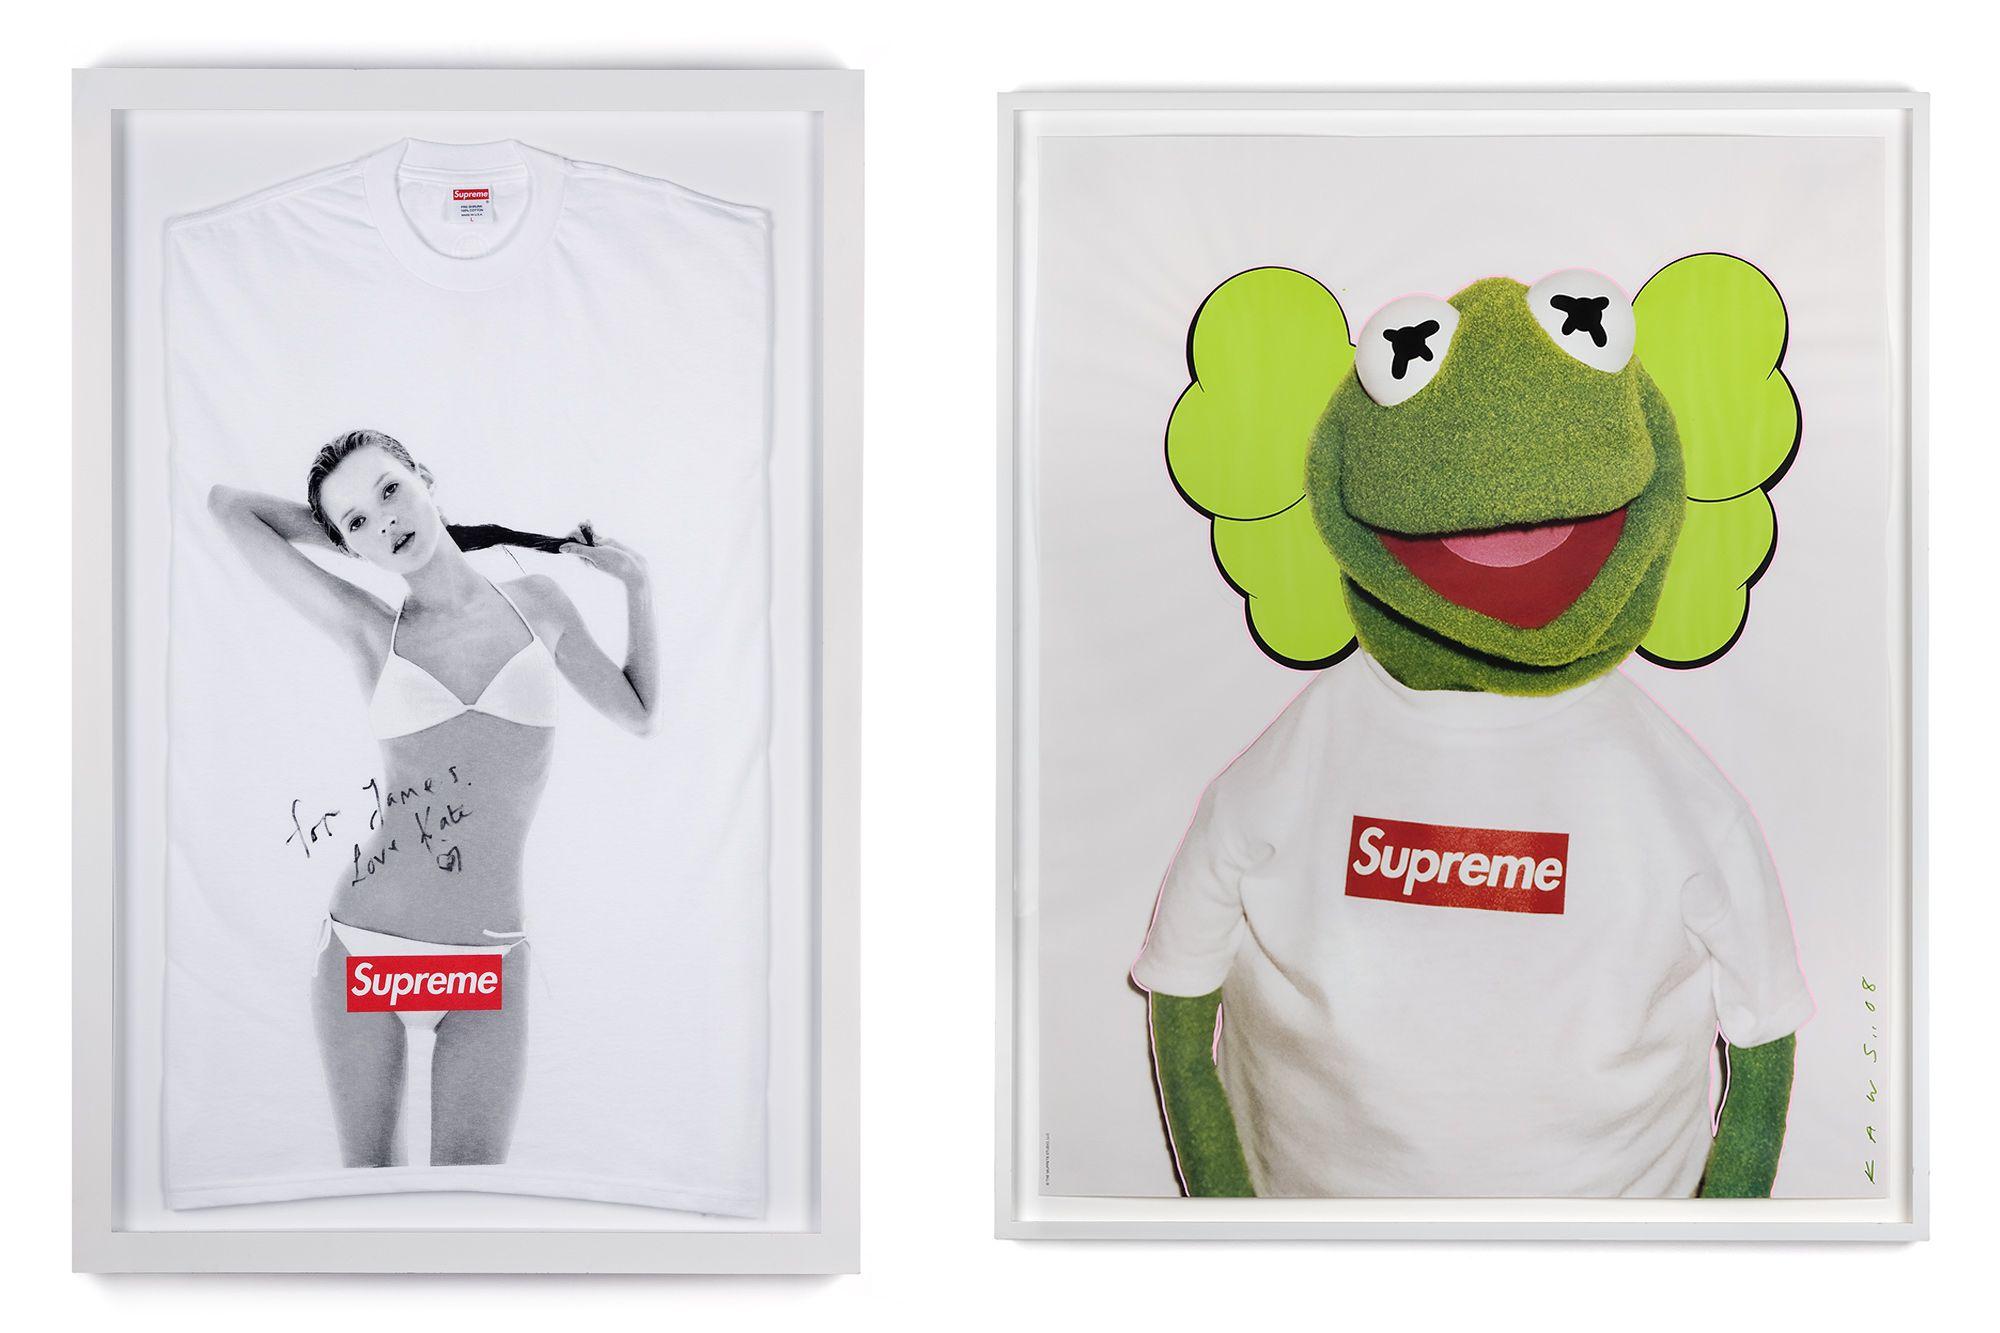 Canvas Kermit the Frog Supreme Model Fashion Style Art Print Poster